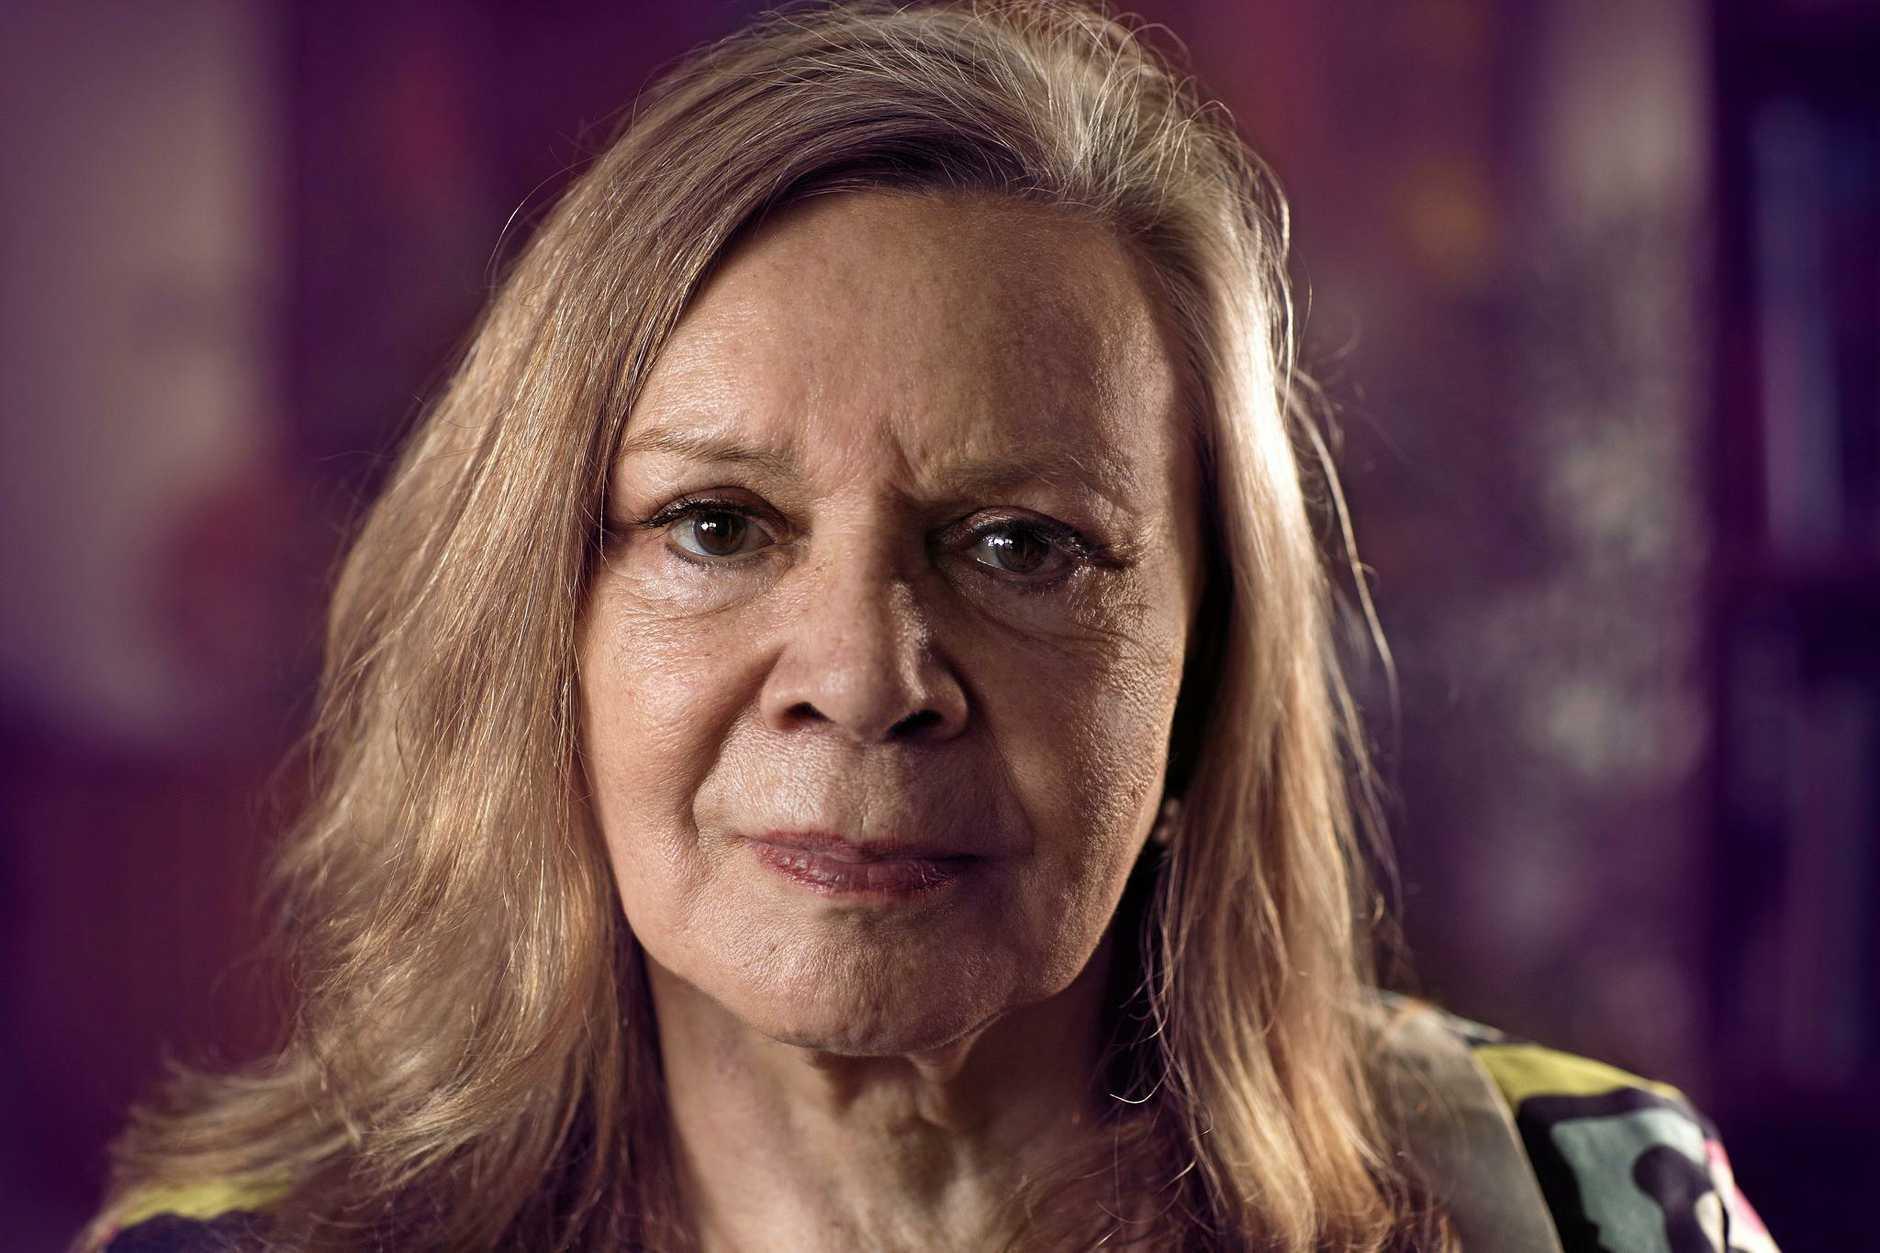 Senior Australian of the Year Award 2017 national finalist, Lois Peeler OAM.